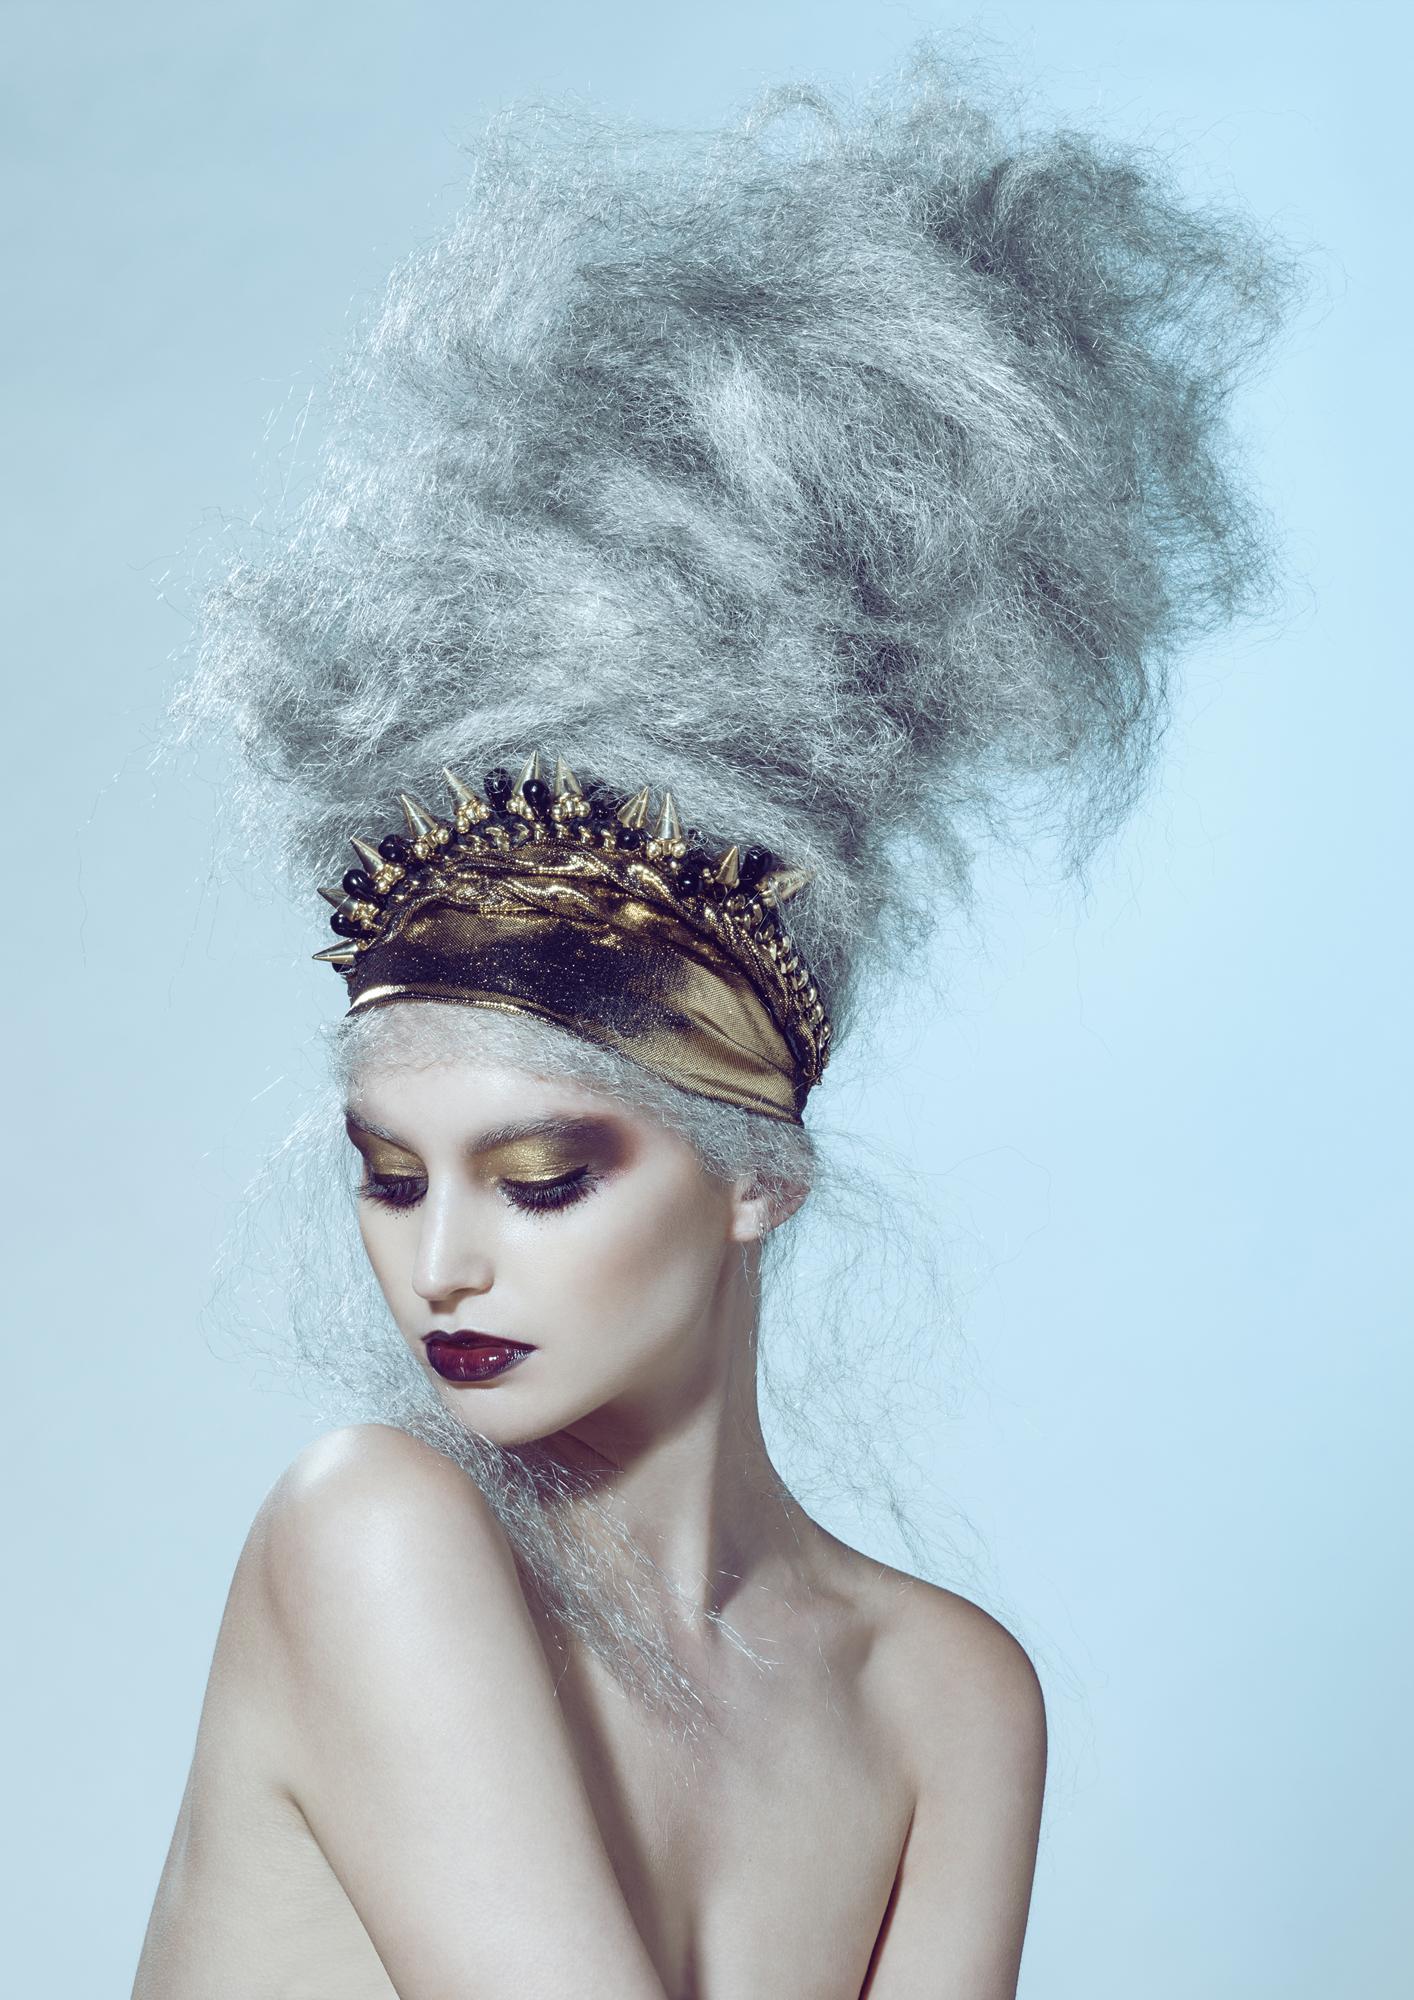 Joanna Kustra Photography - Vanessa Grasse @ MandP Models - h Kasia Fortuna Hair - mua Laura Louise (lauraloumakeu) 1